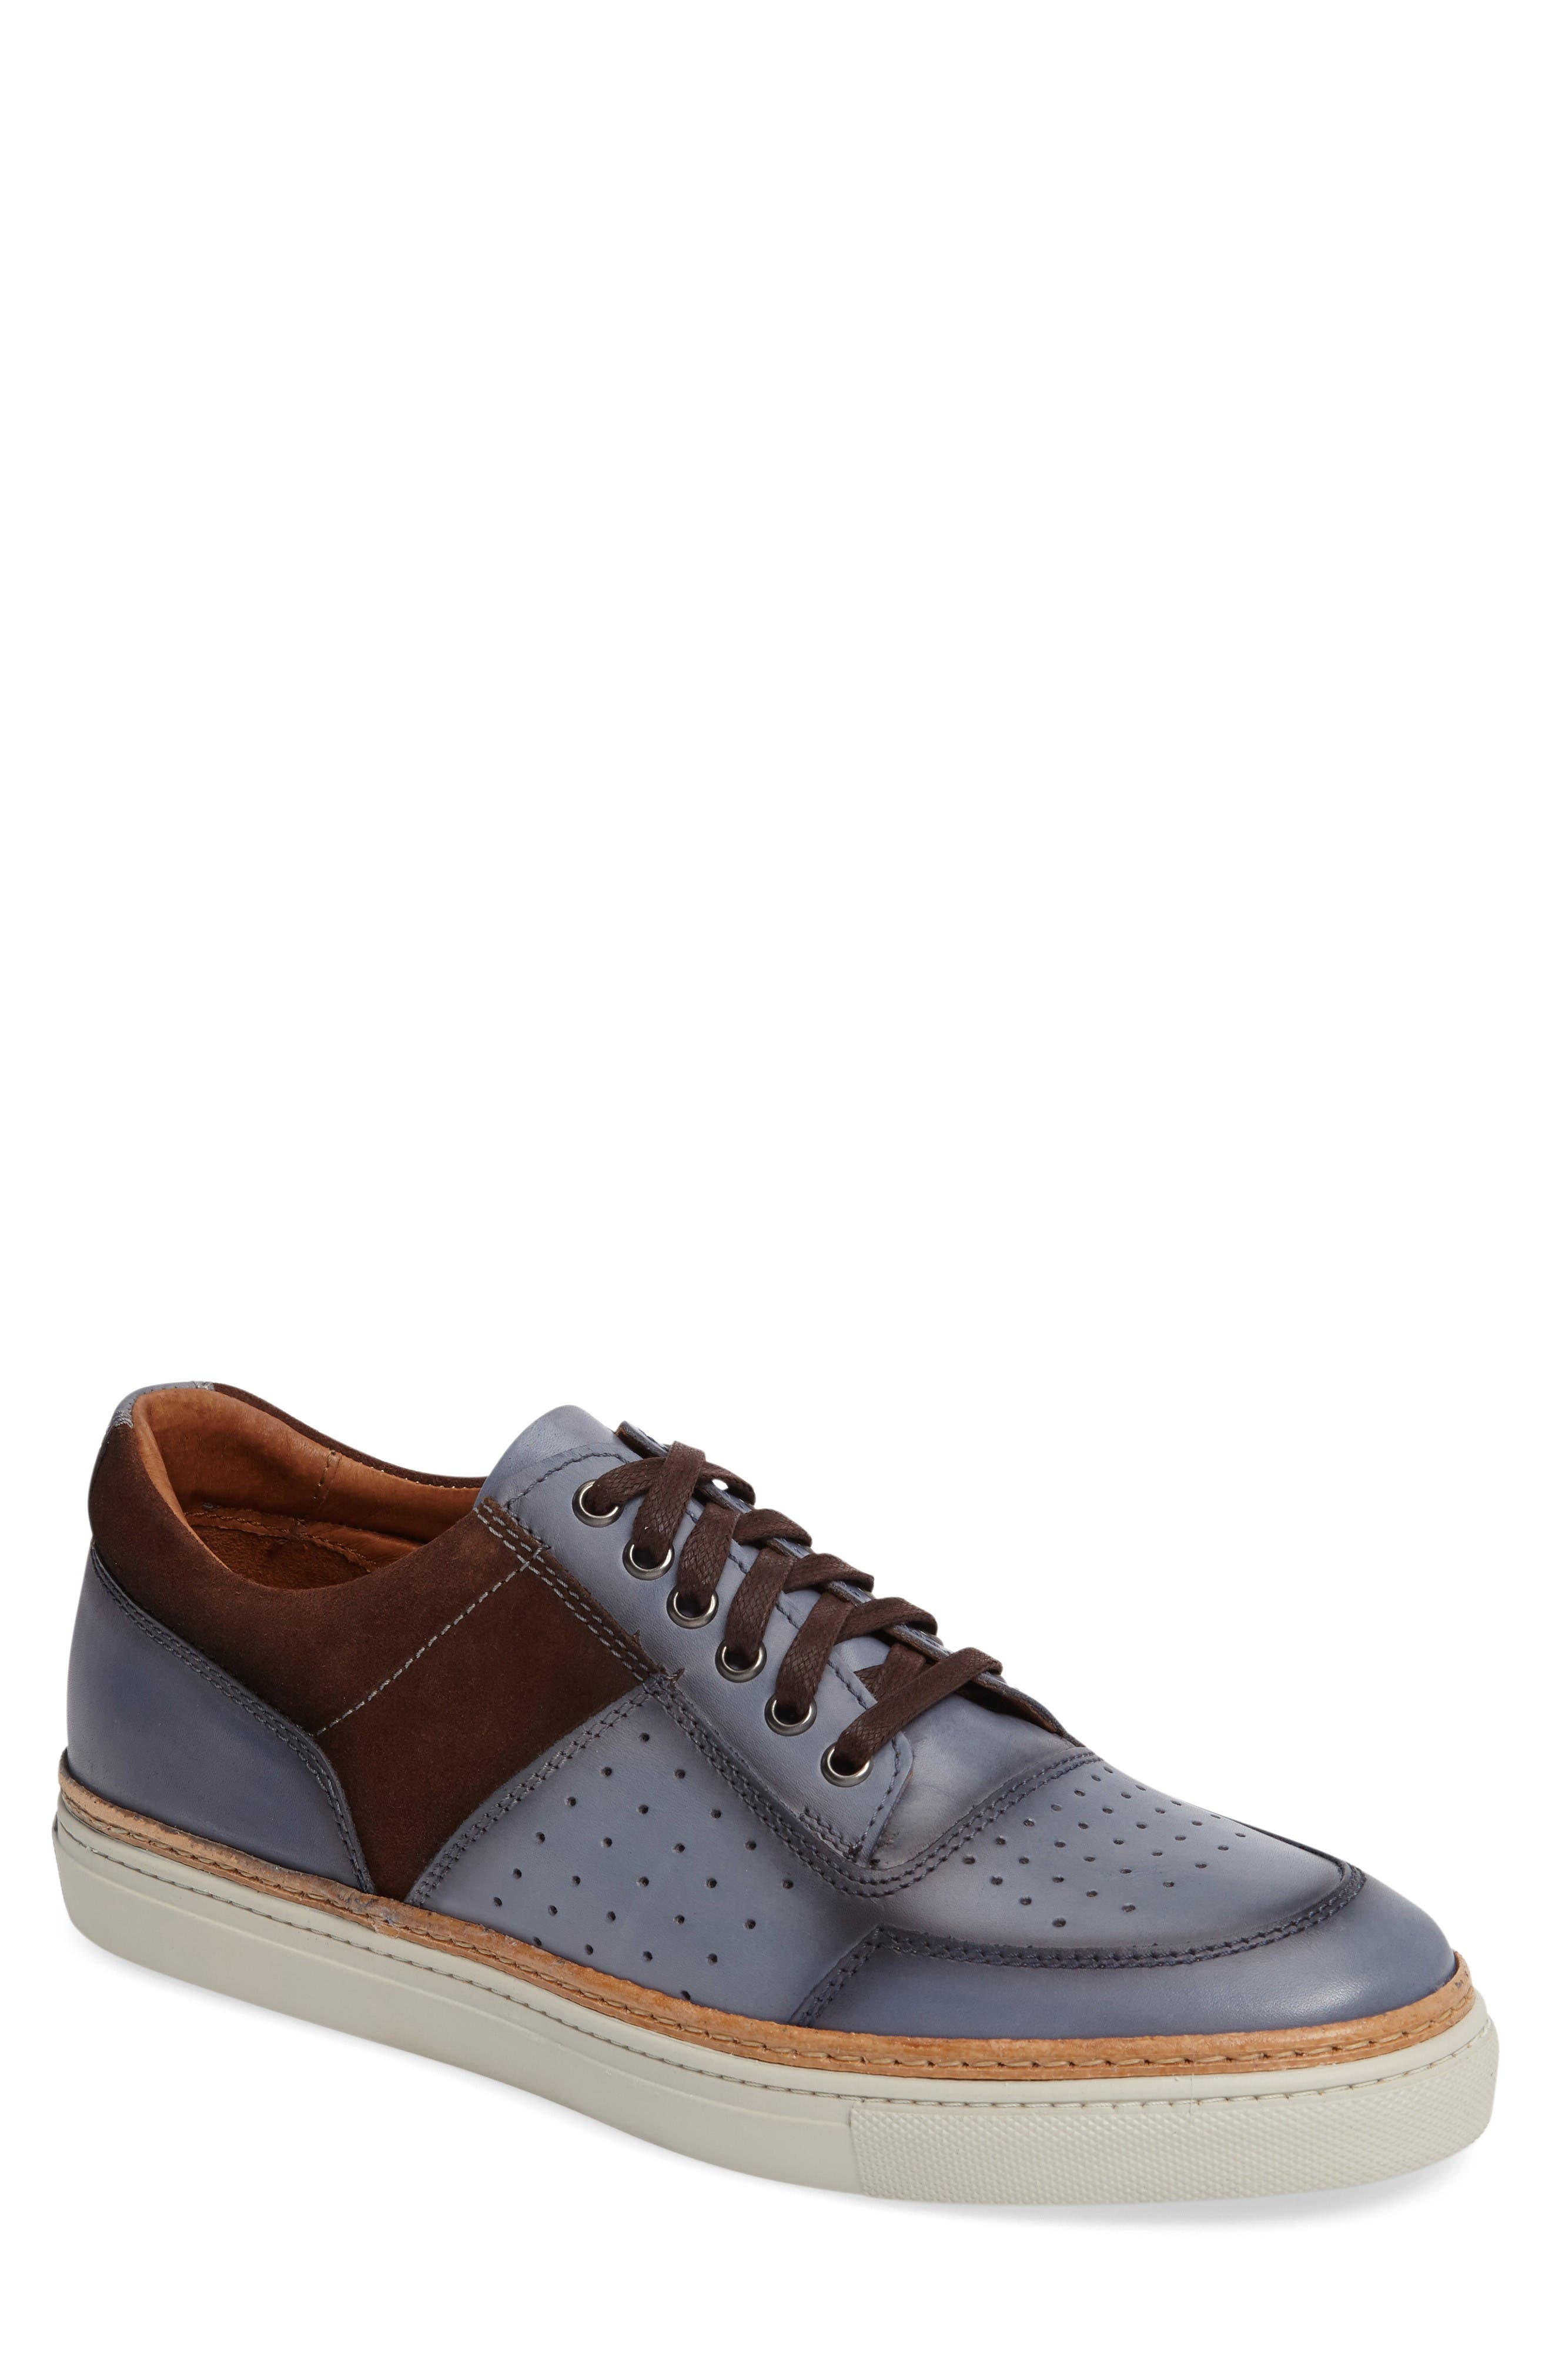 Kenneth Cole New York Prem-Ier Sneaker (Men)